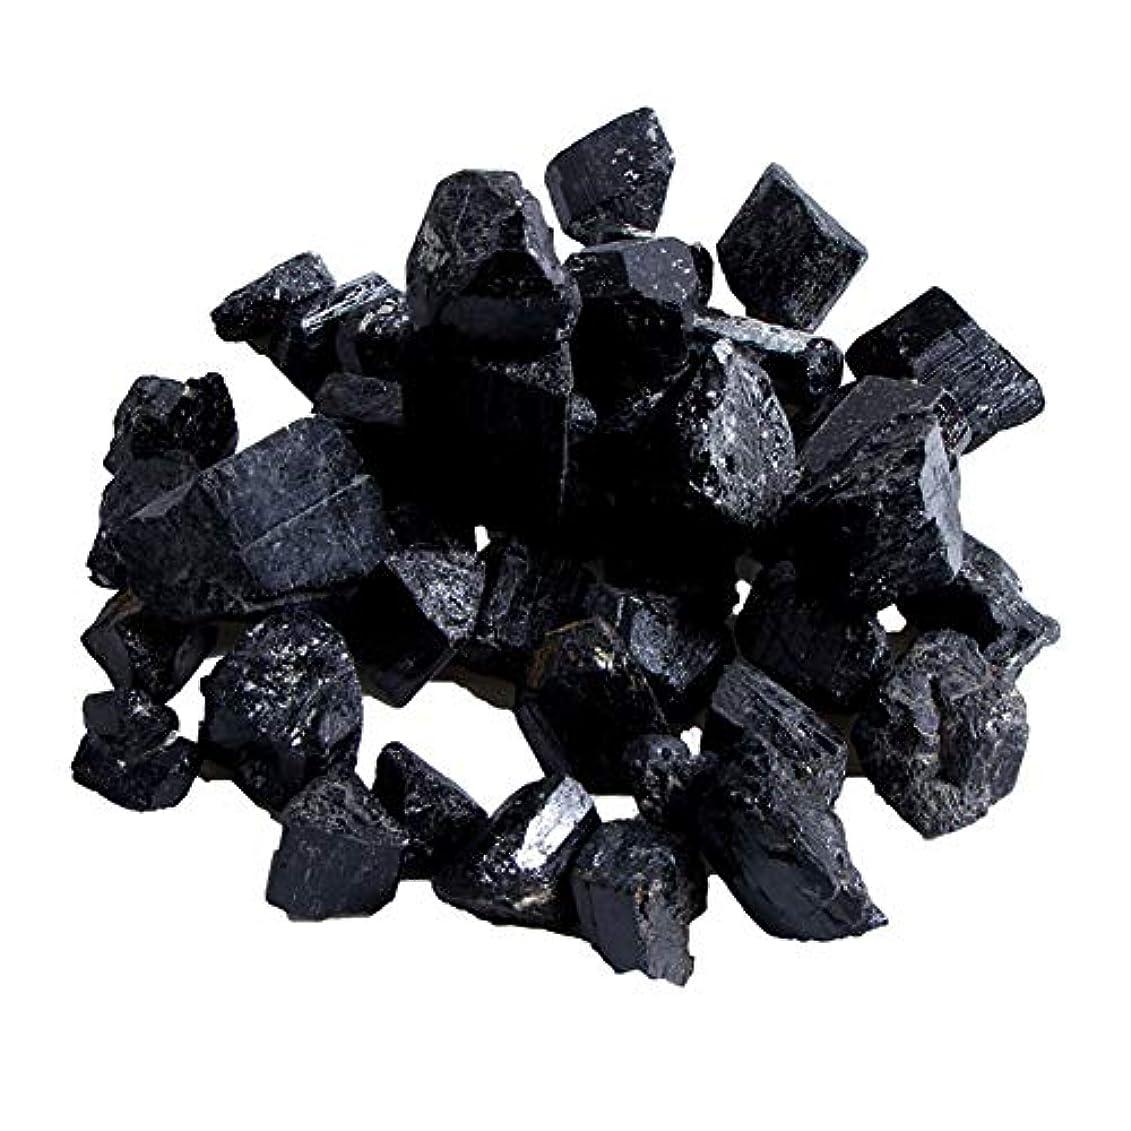 Profeel 蒸し部屋用の天然黒トルマリンクリスタルラフストーンロック鉱物標本新しい